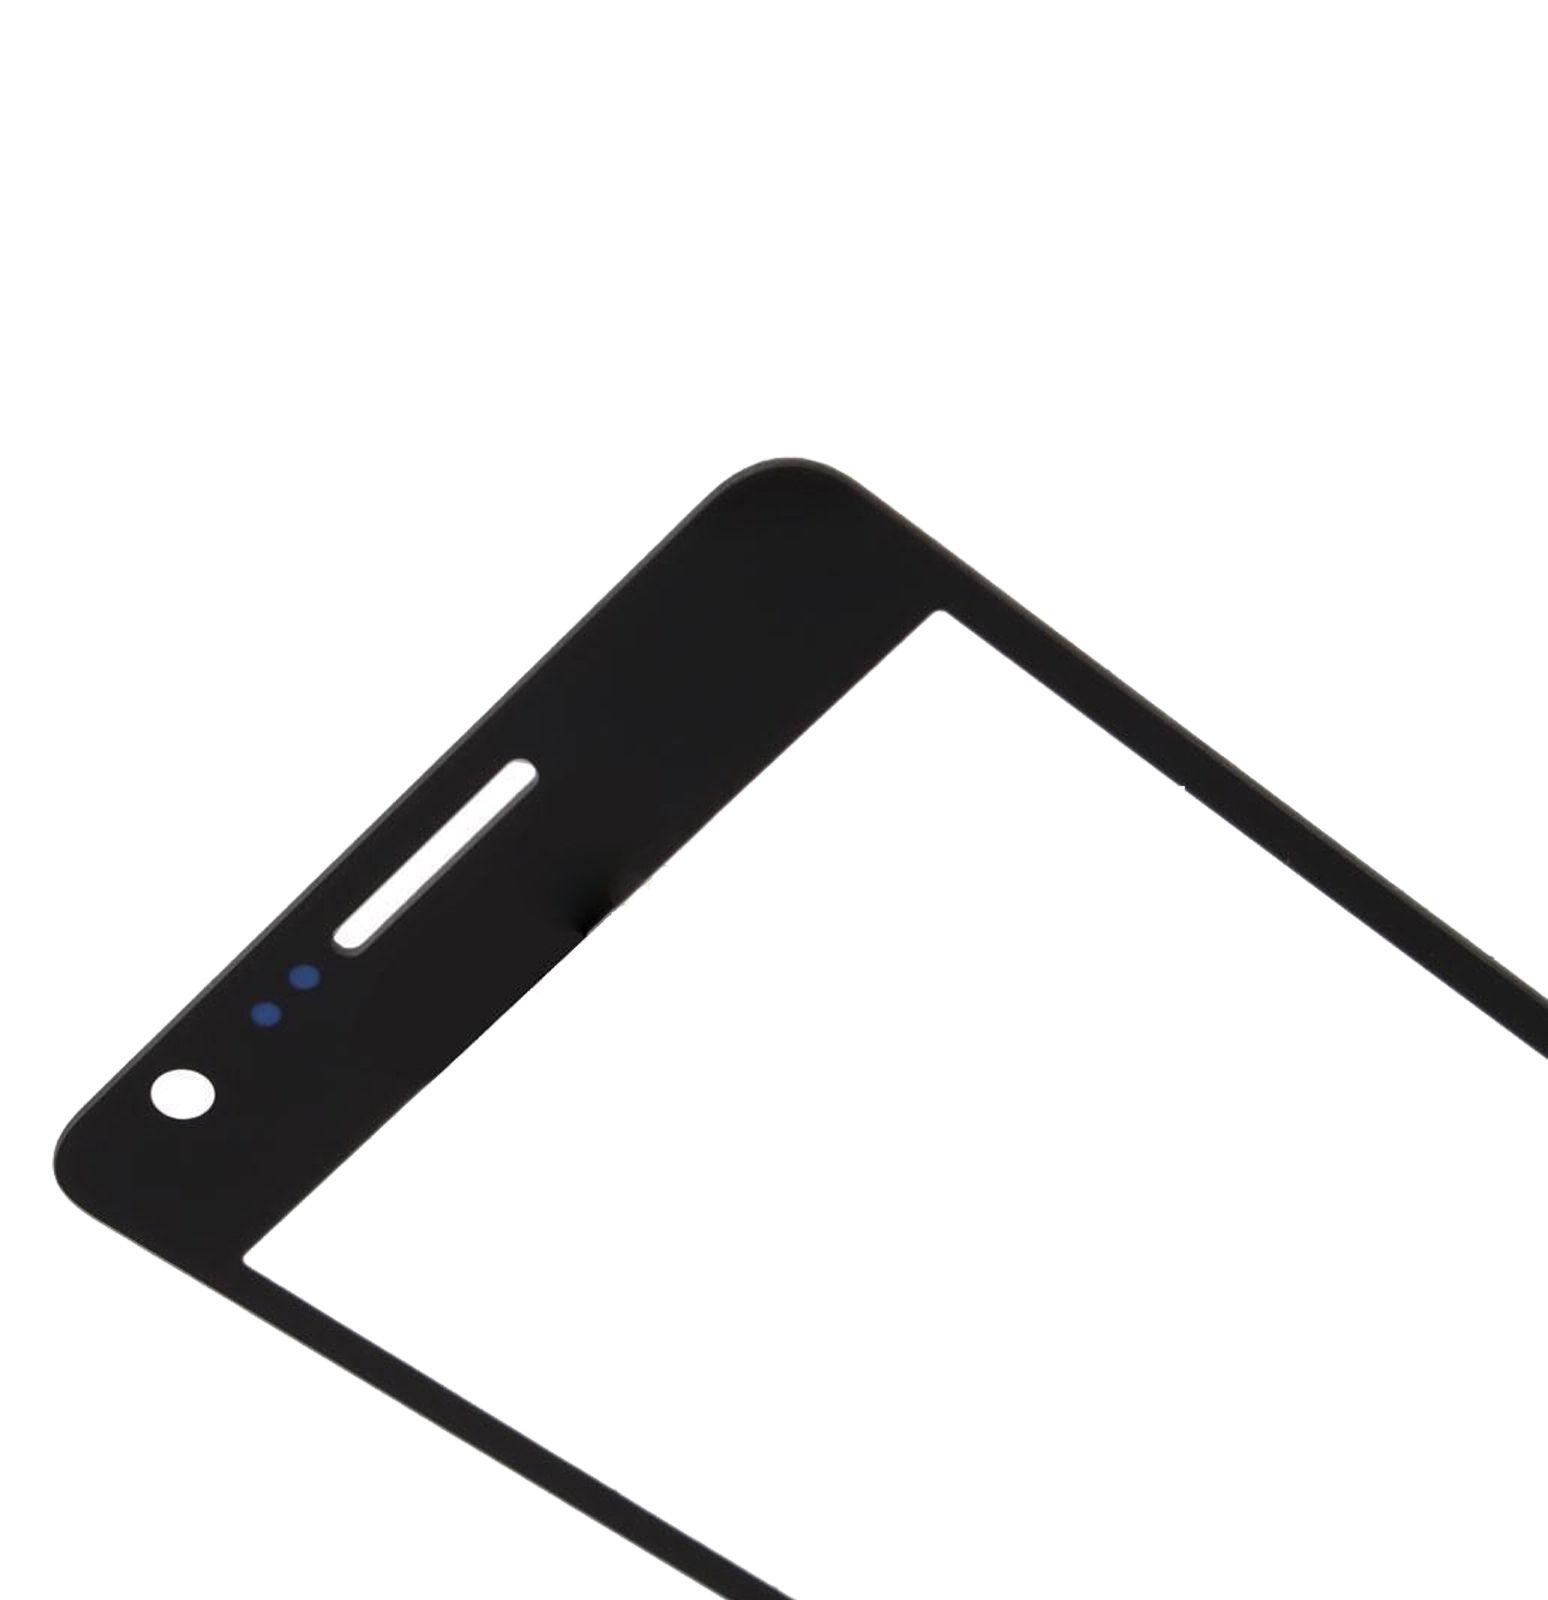 Samsung-Galaxy--II-S2-I9100-I9100G-I9105-I9105P-S2-Plus-Glass-Outer-Touch-گلس-شیشه-تاچ-لنز-گوشی-موبایل-سامسونگ-گلکسی-اس2.jpg